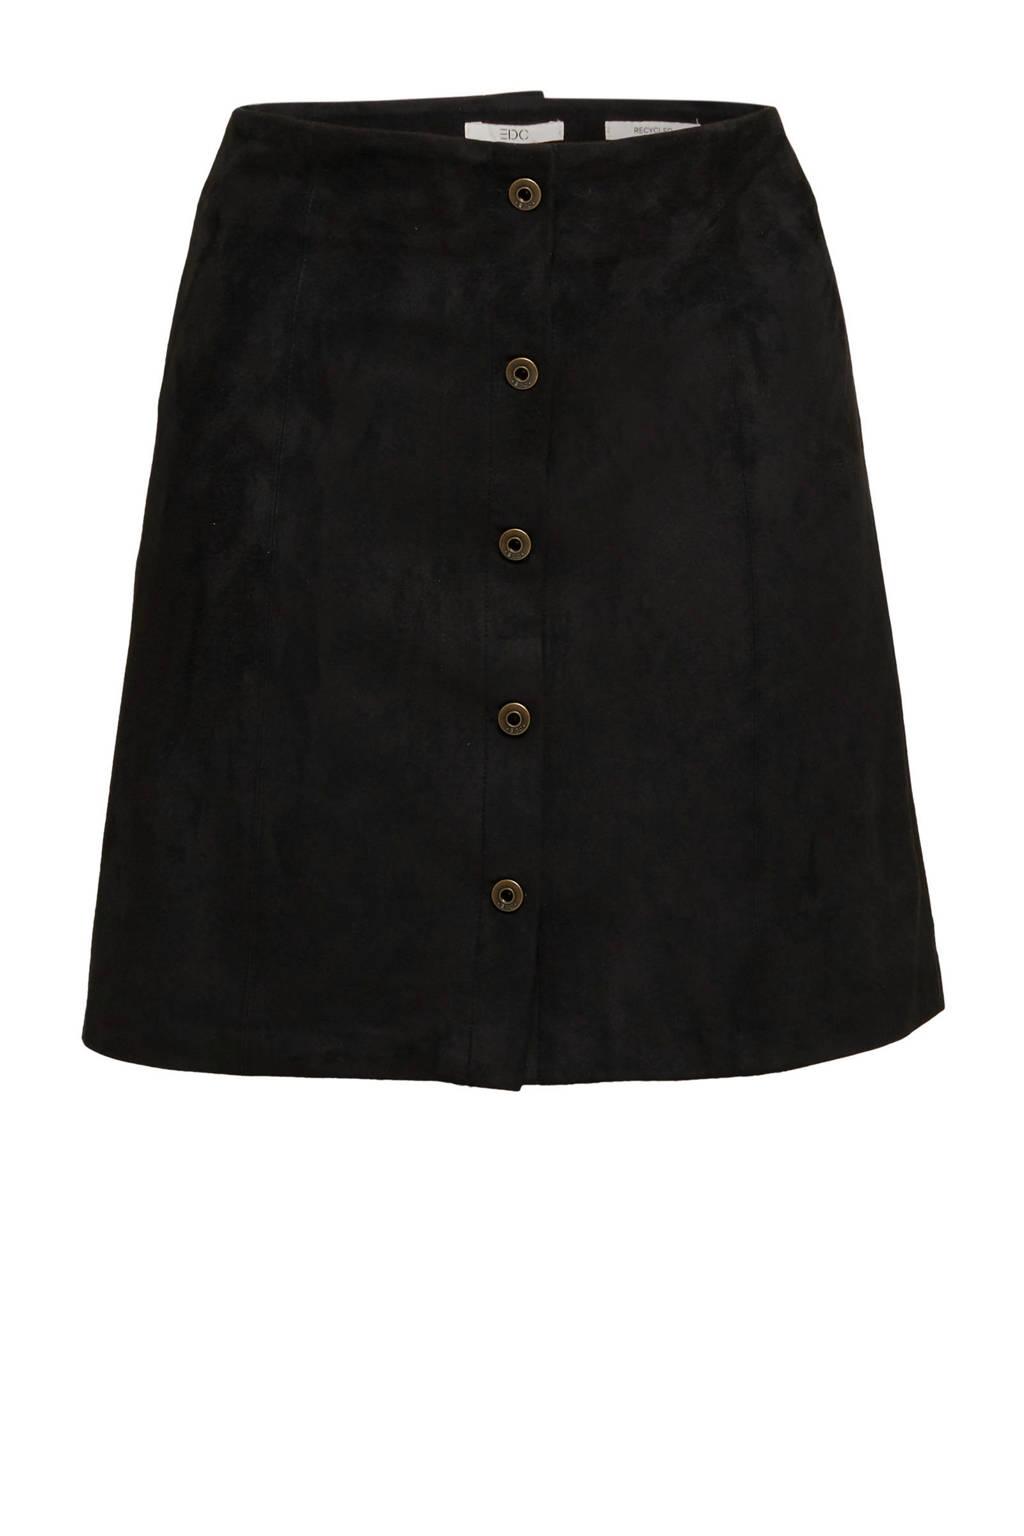 edc Women rok zwart, Zwart